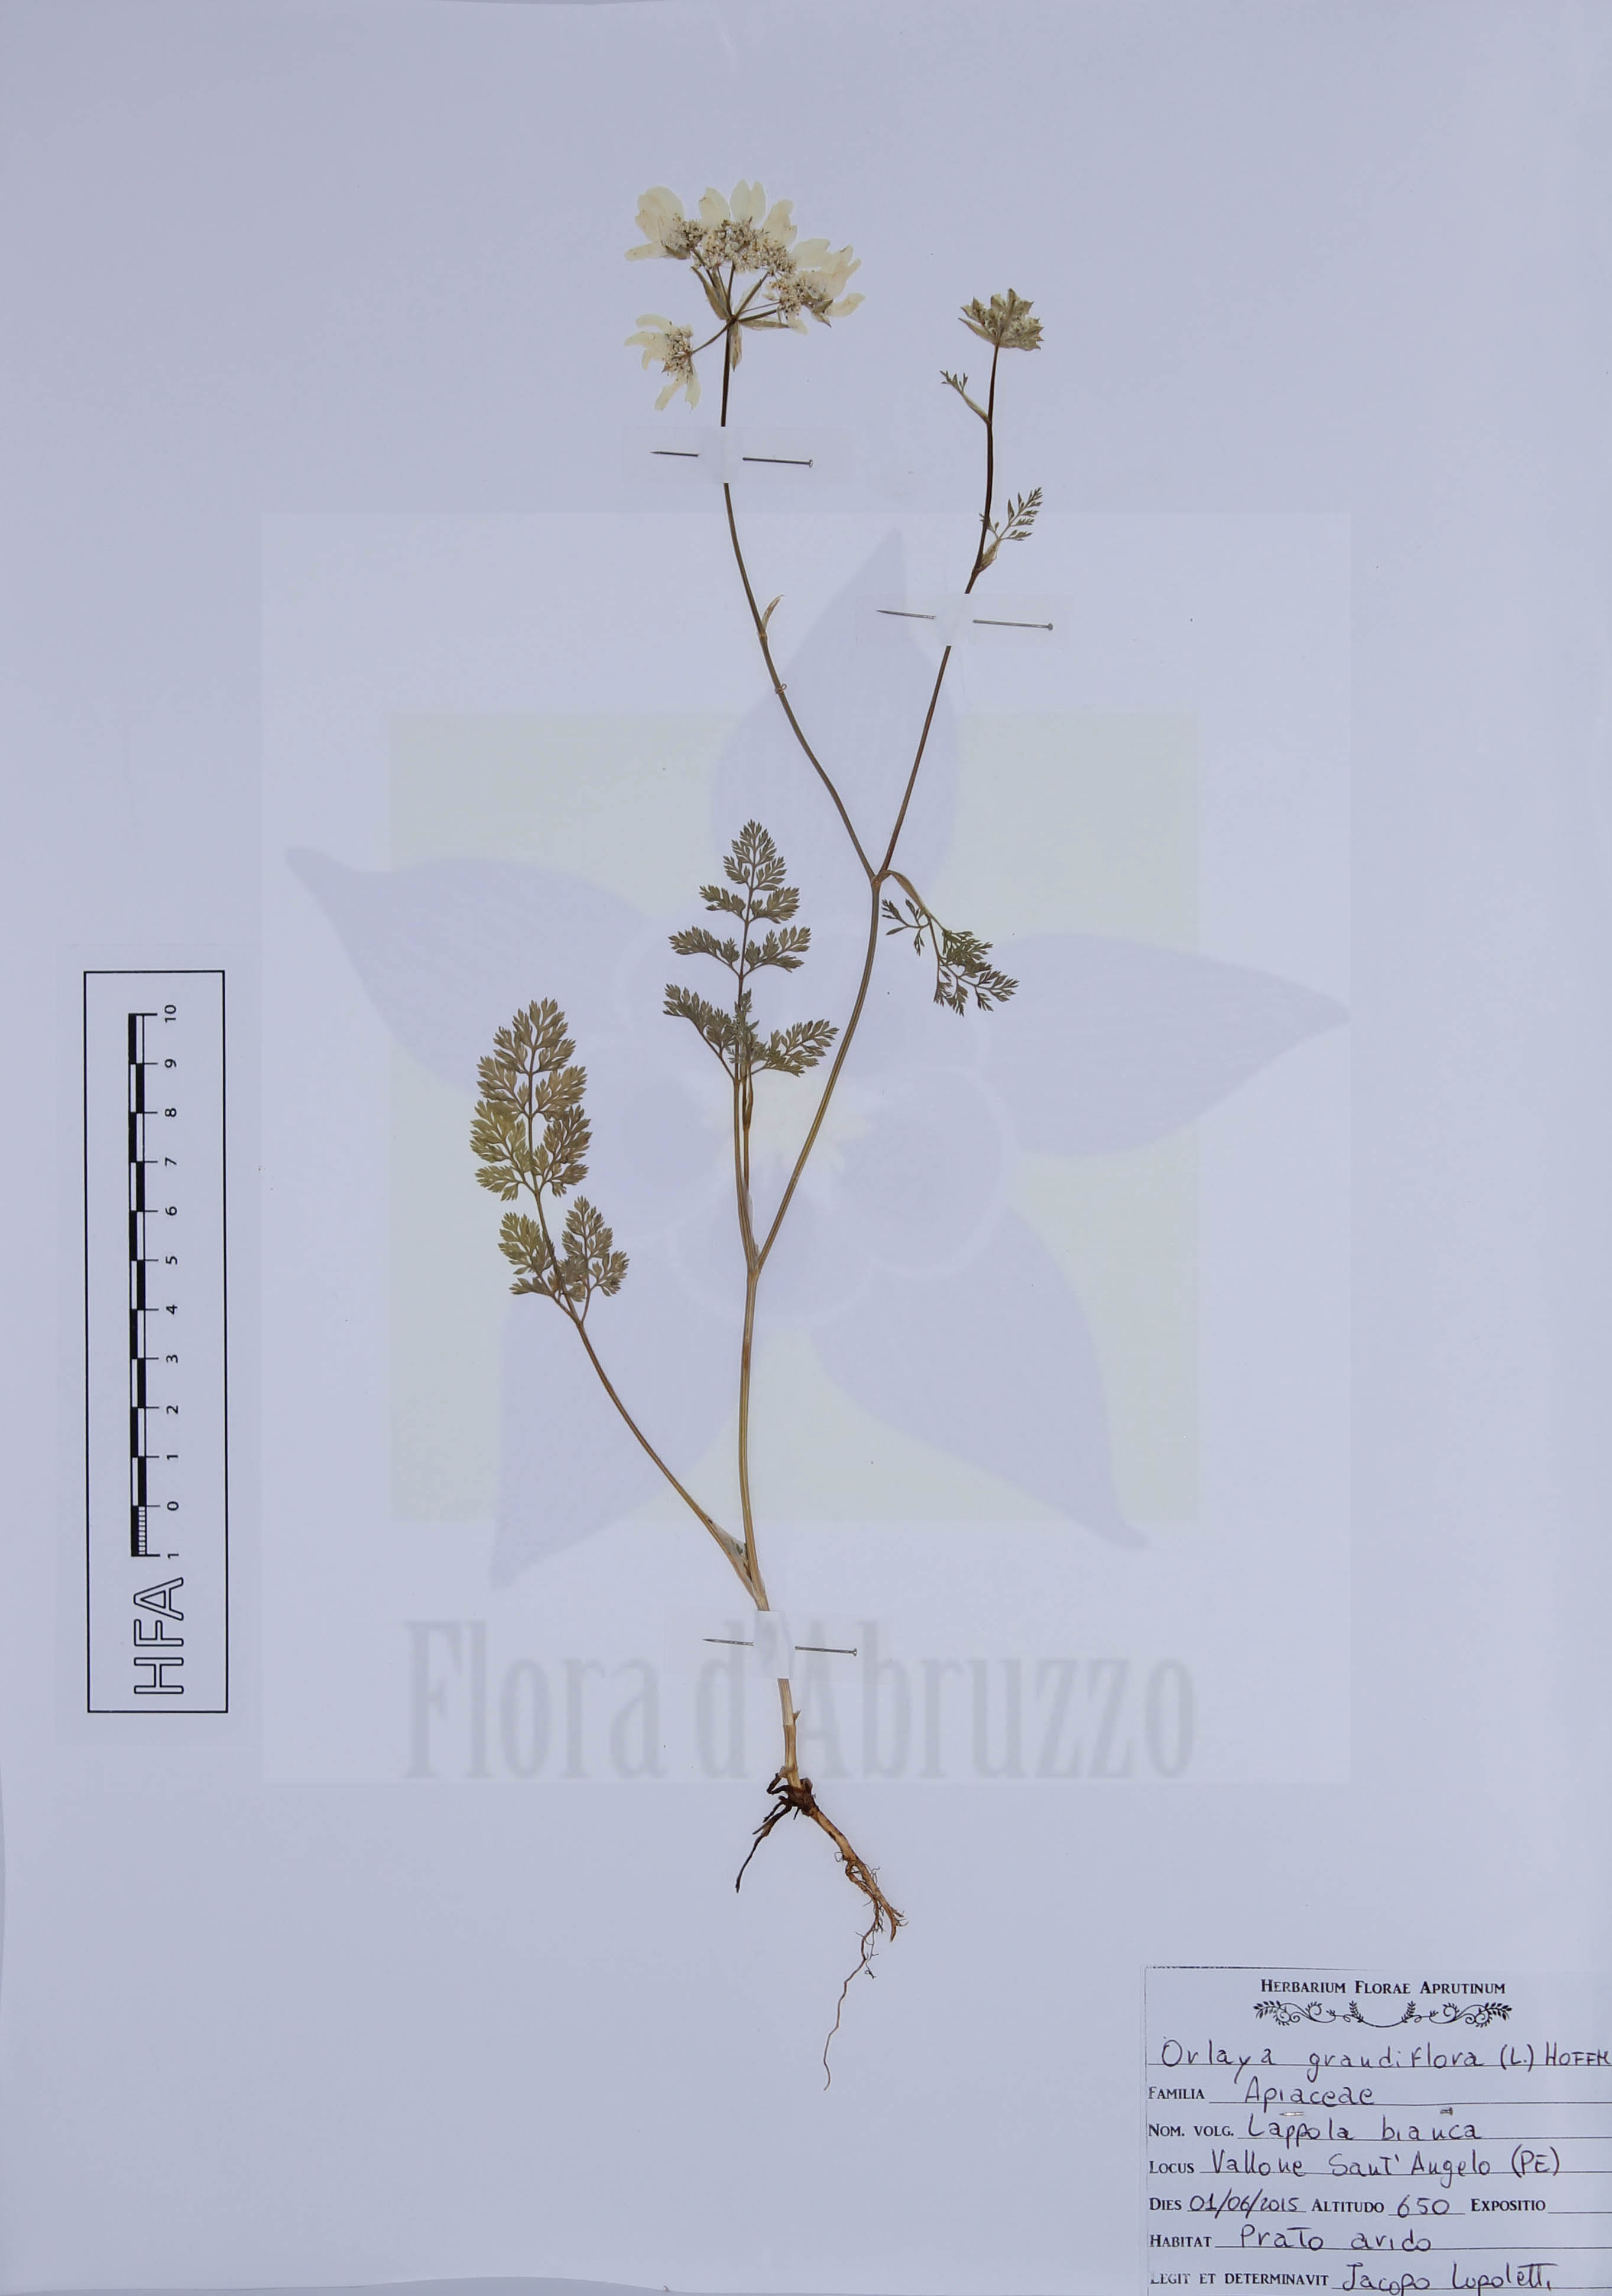 Orlaya grandiflora (L.) Hoffm